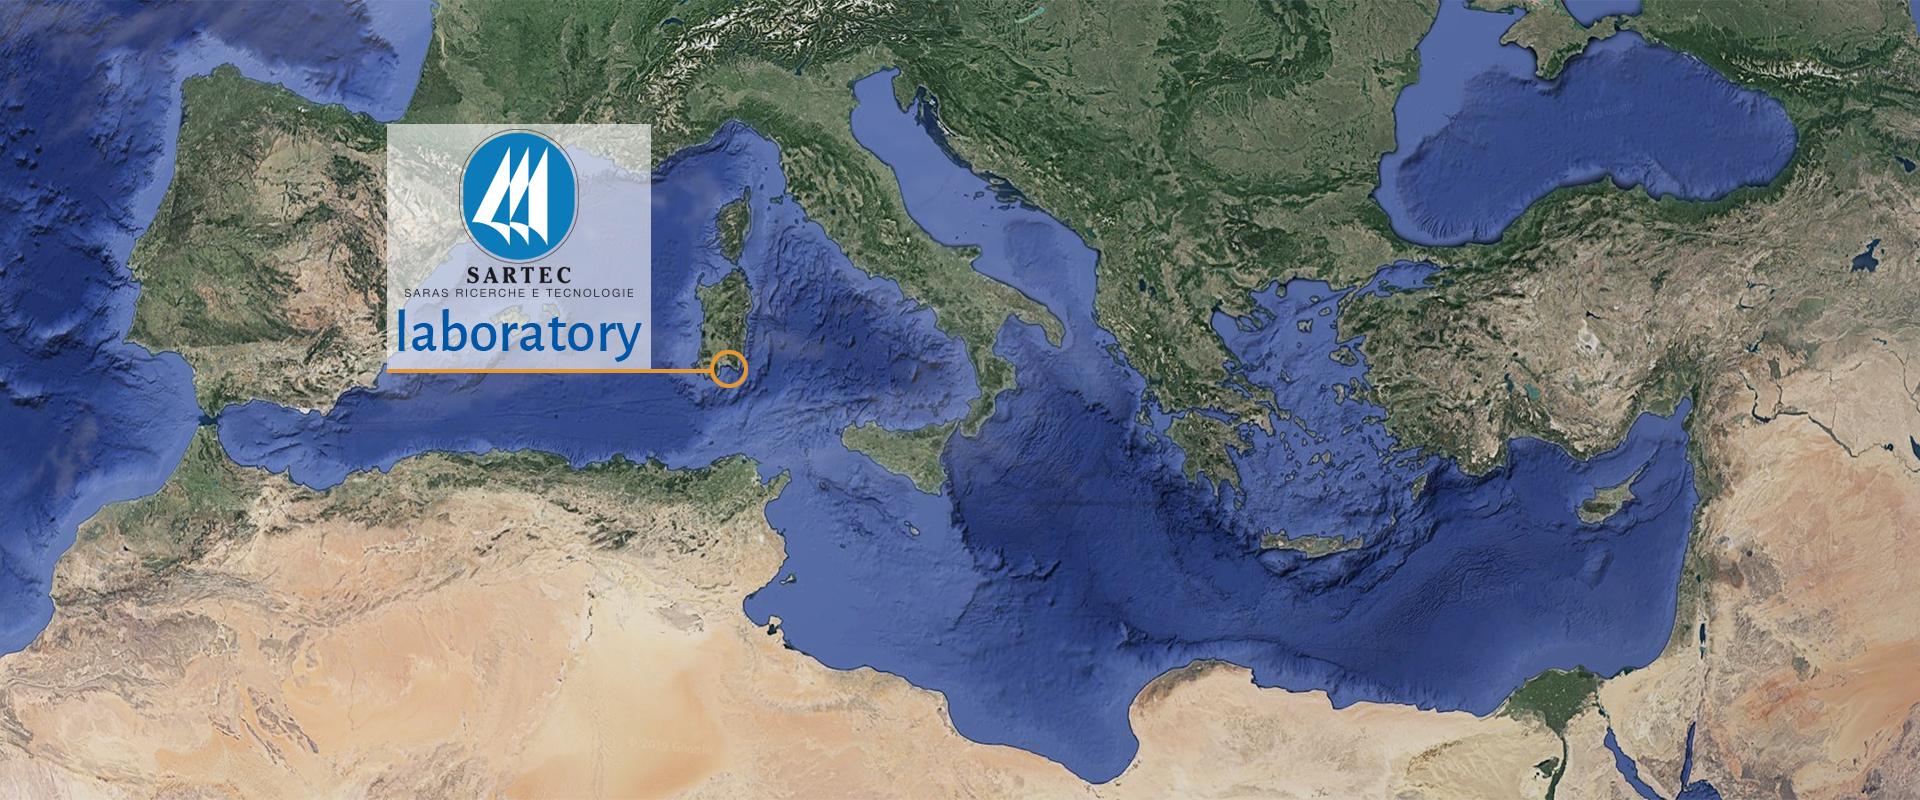 bunker, bunkering, bunker analysis, bunker testing, ISO 8217, IMO 2020, marine bunker fuel, bunkering sarroch, bunkering sarlux, bunkering mediterranean, Sartec, Cagliari, Gulf of Angels, Gulf of Cagliari, Sardinia